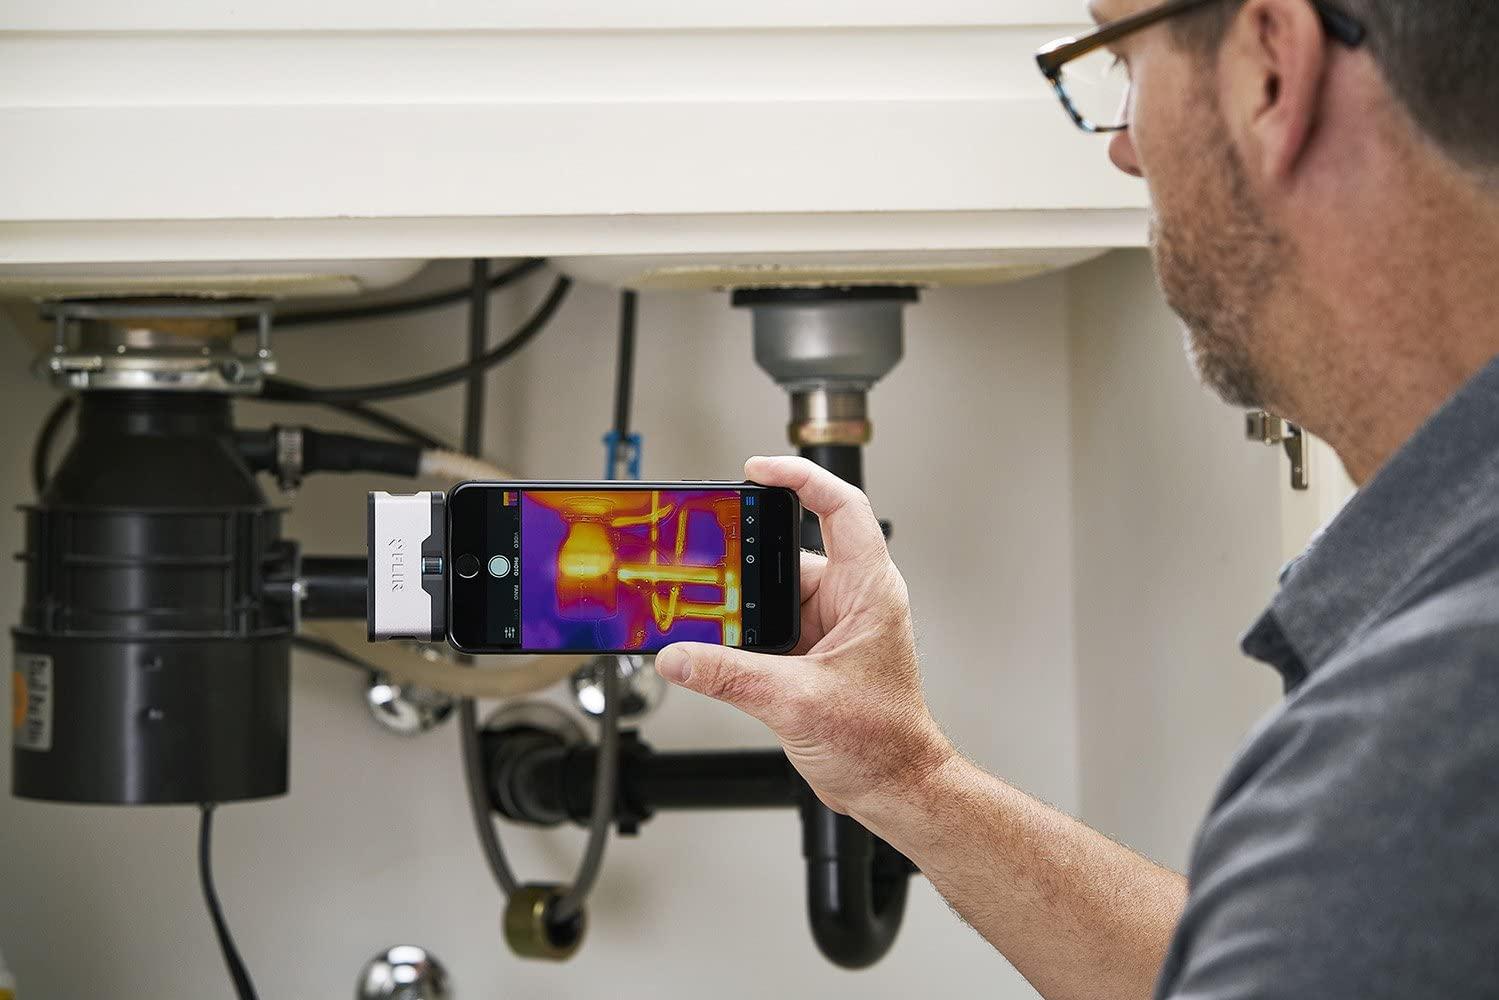 Câmera Termográfica para Celular 4.800 PIXELS (-20 °C A 120 °C) Flir One Gen 3 IOS  - MRE Ferramentas